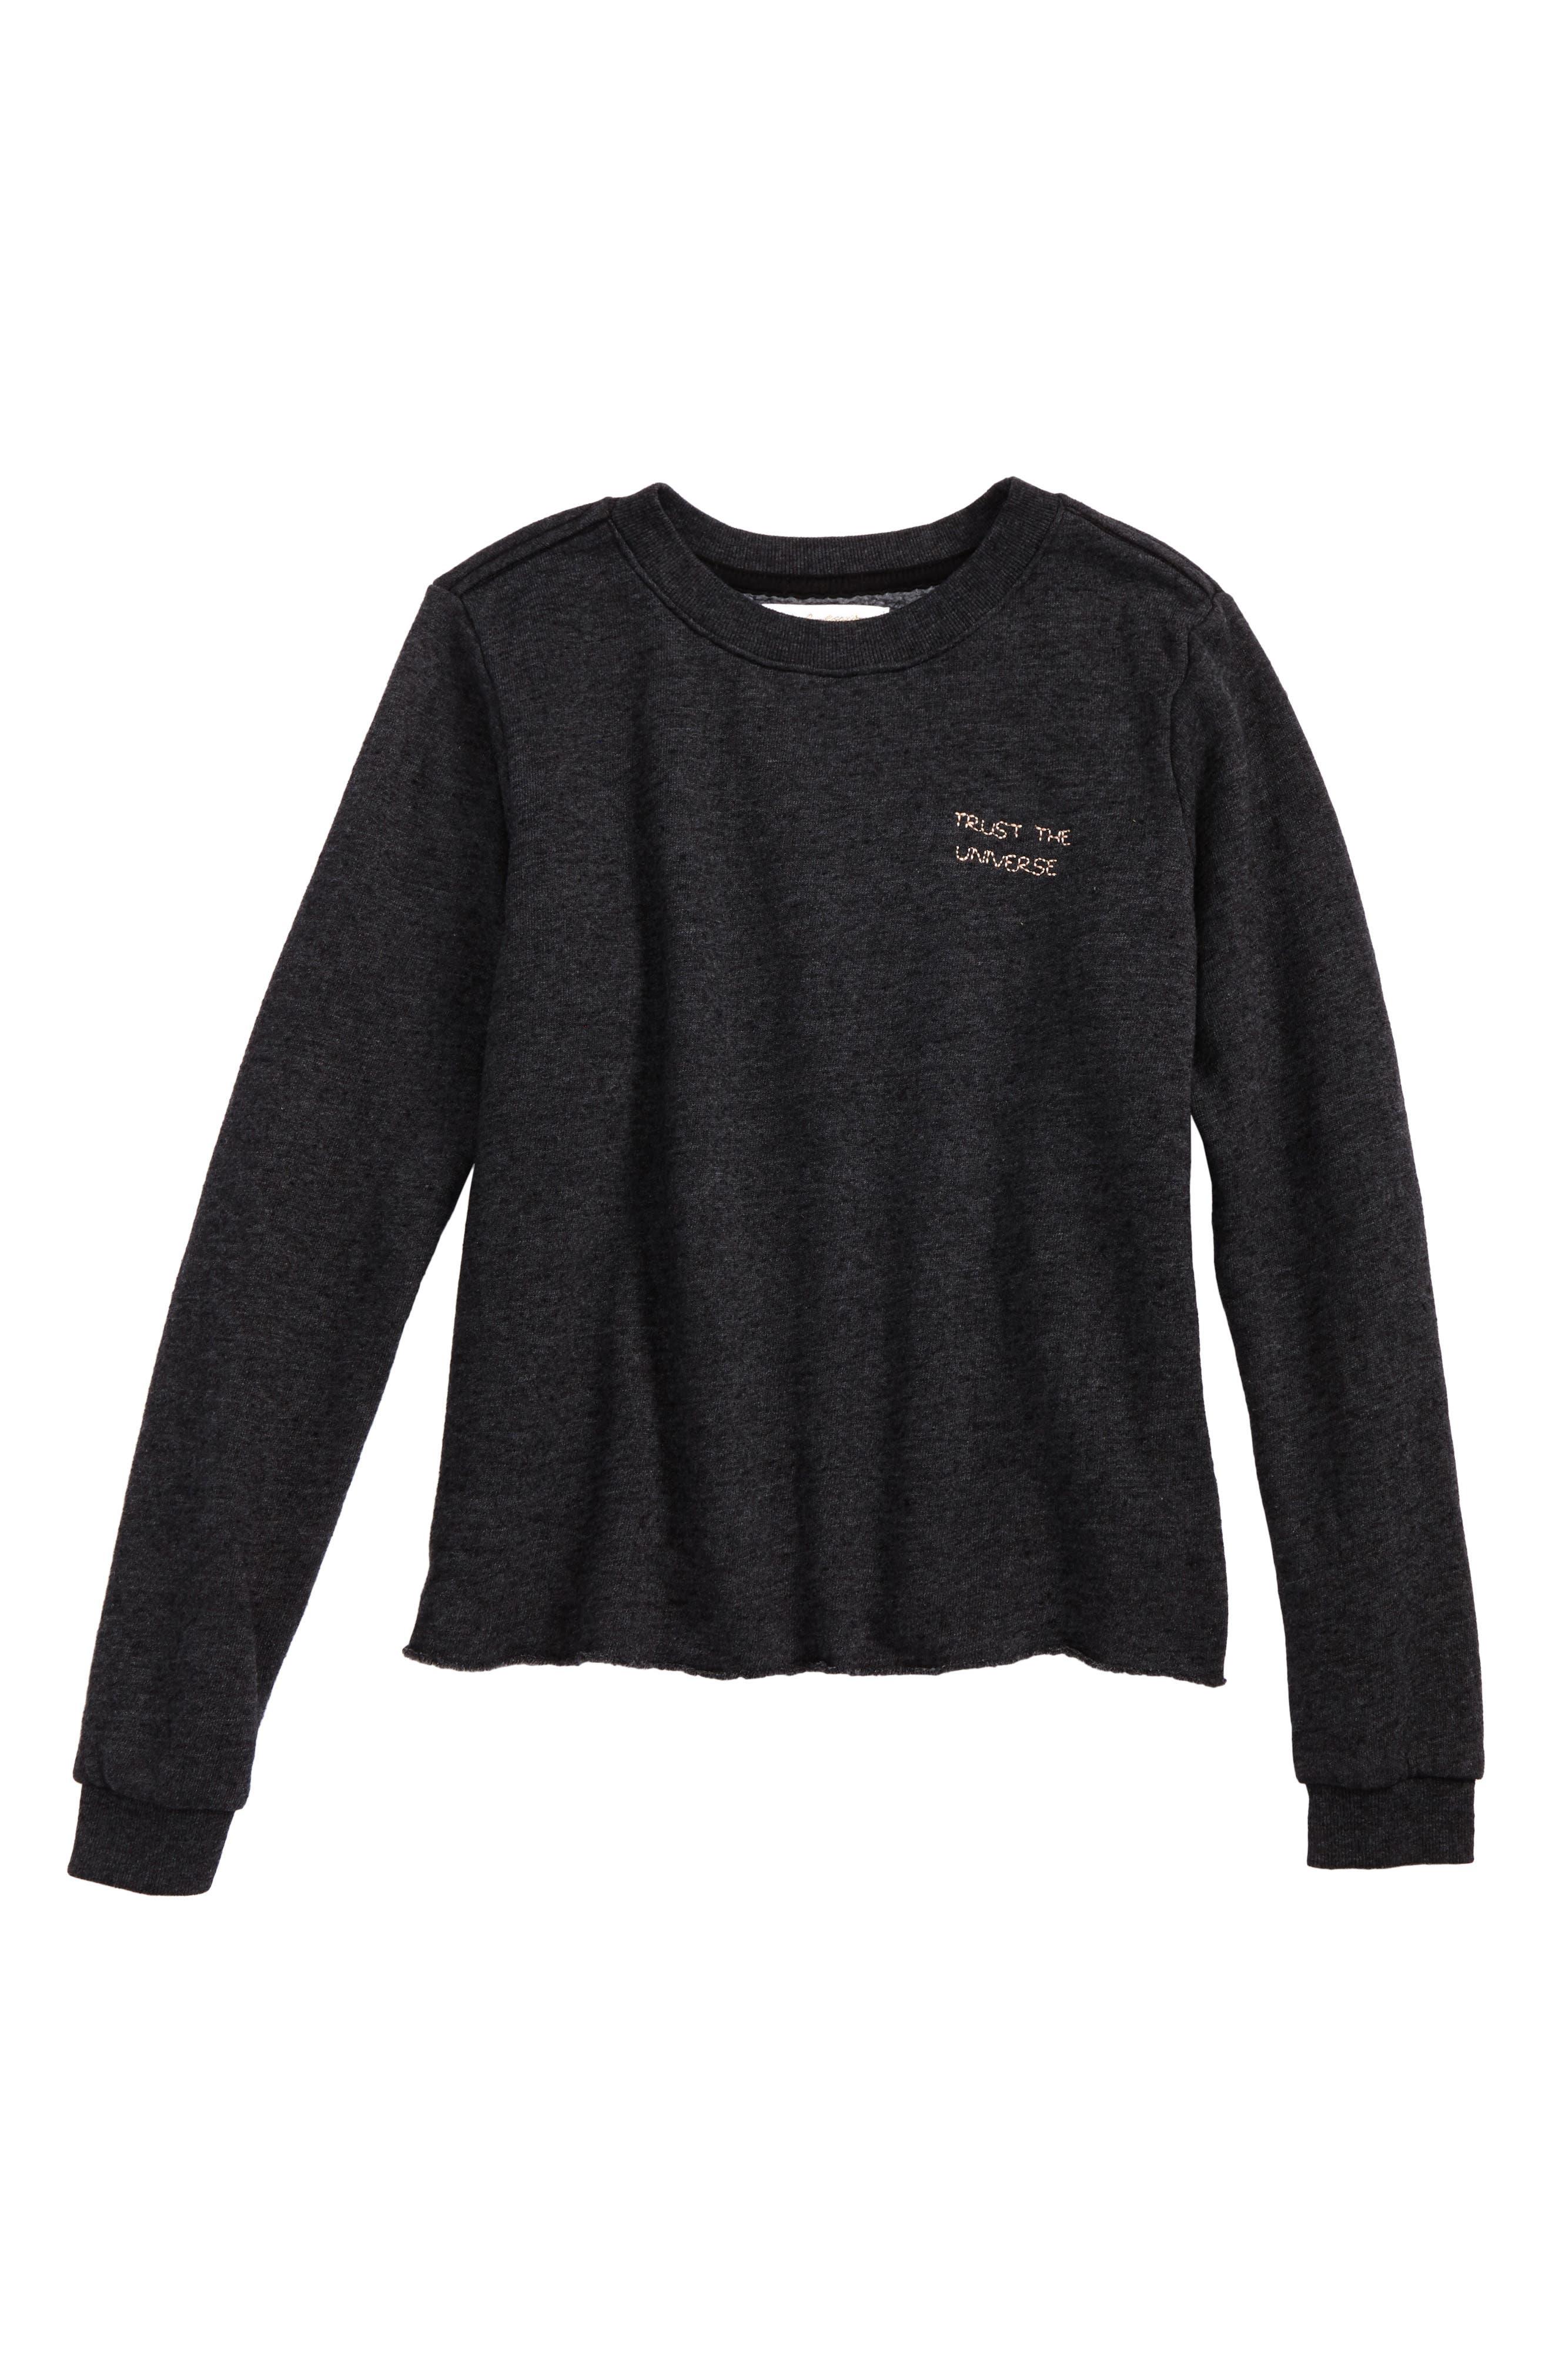 Trust the Universe Crop Sweatshirt,                         Main,                         color, Vintage Black